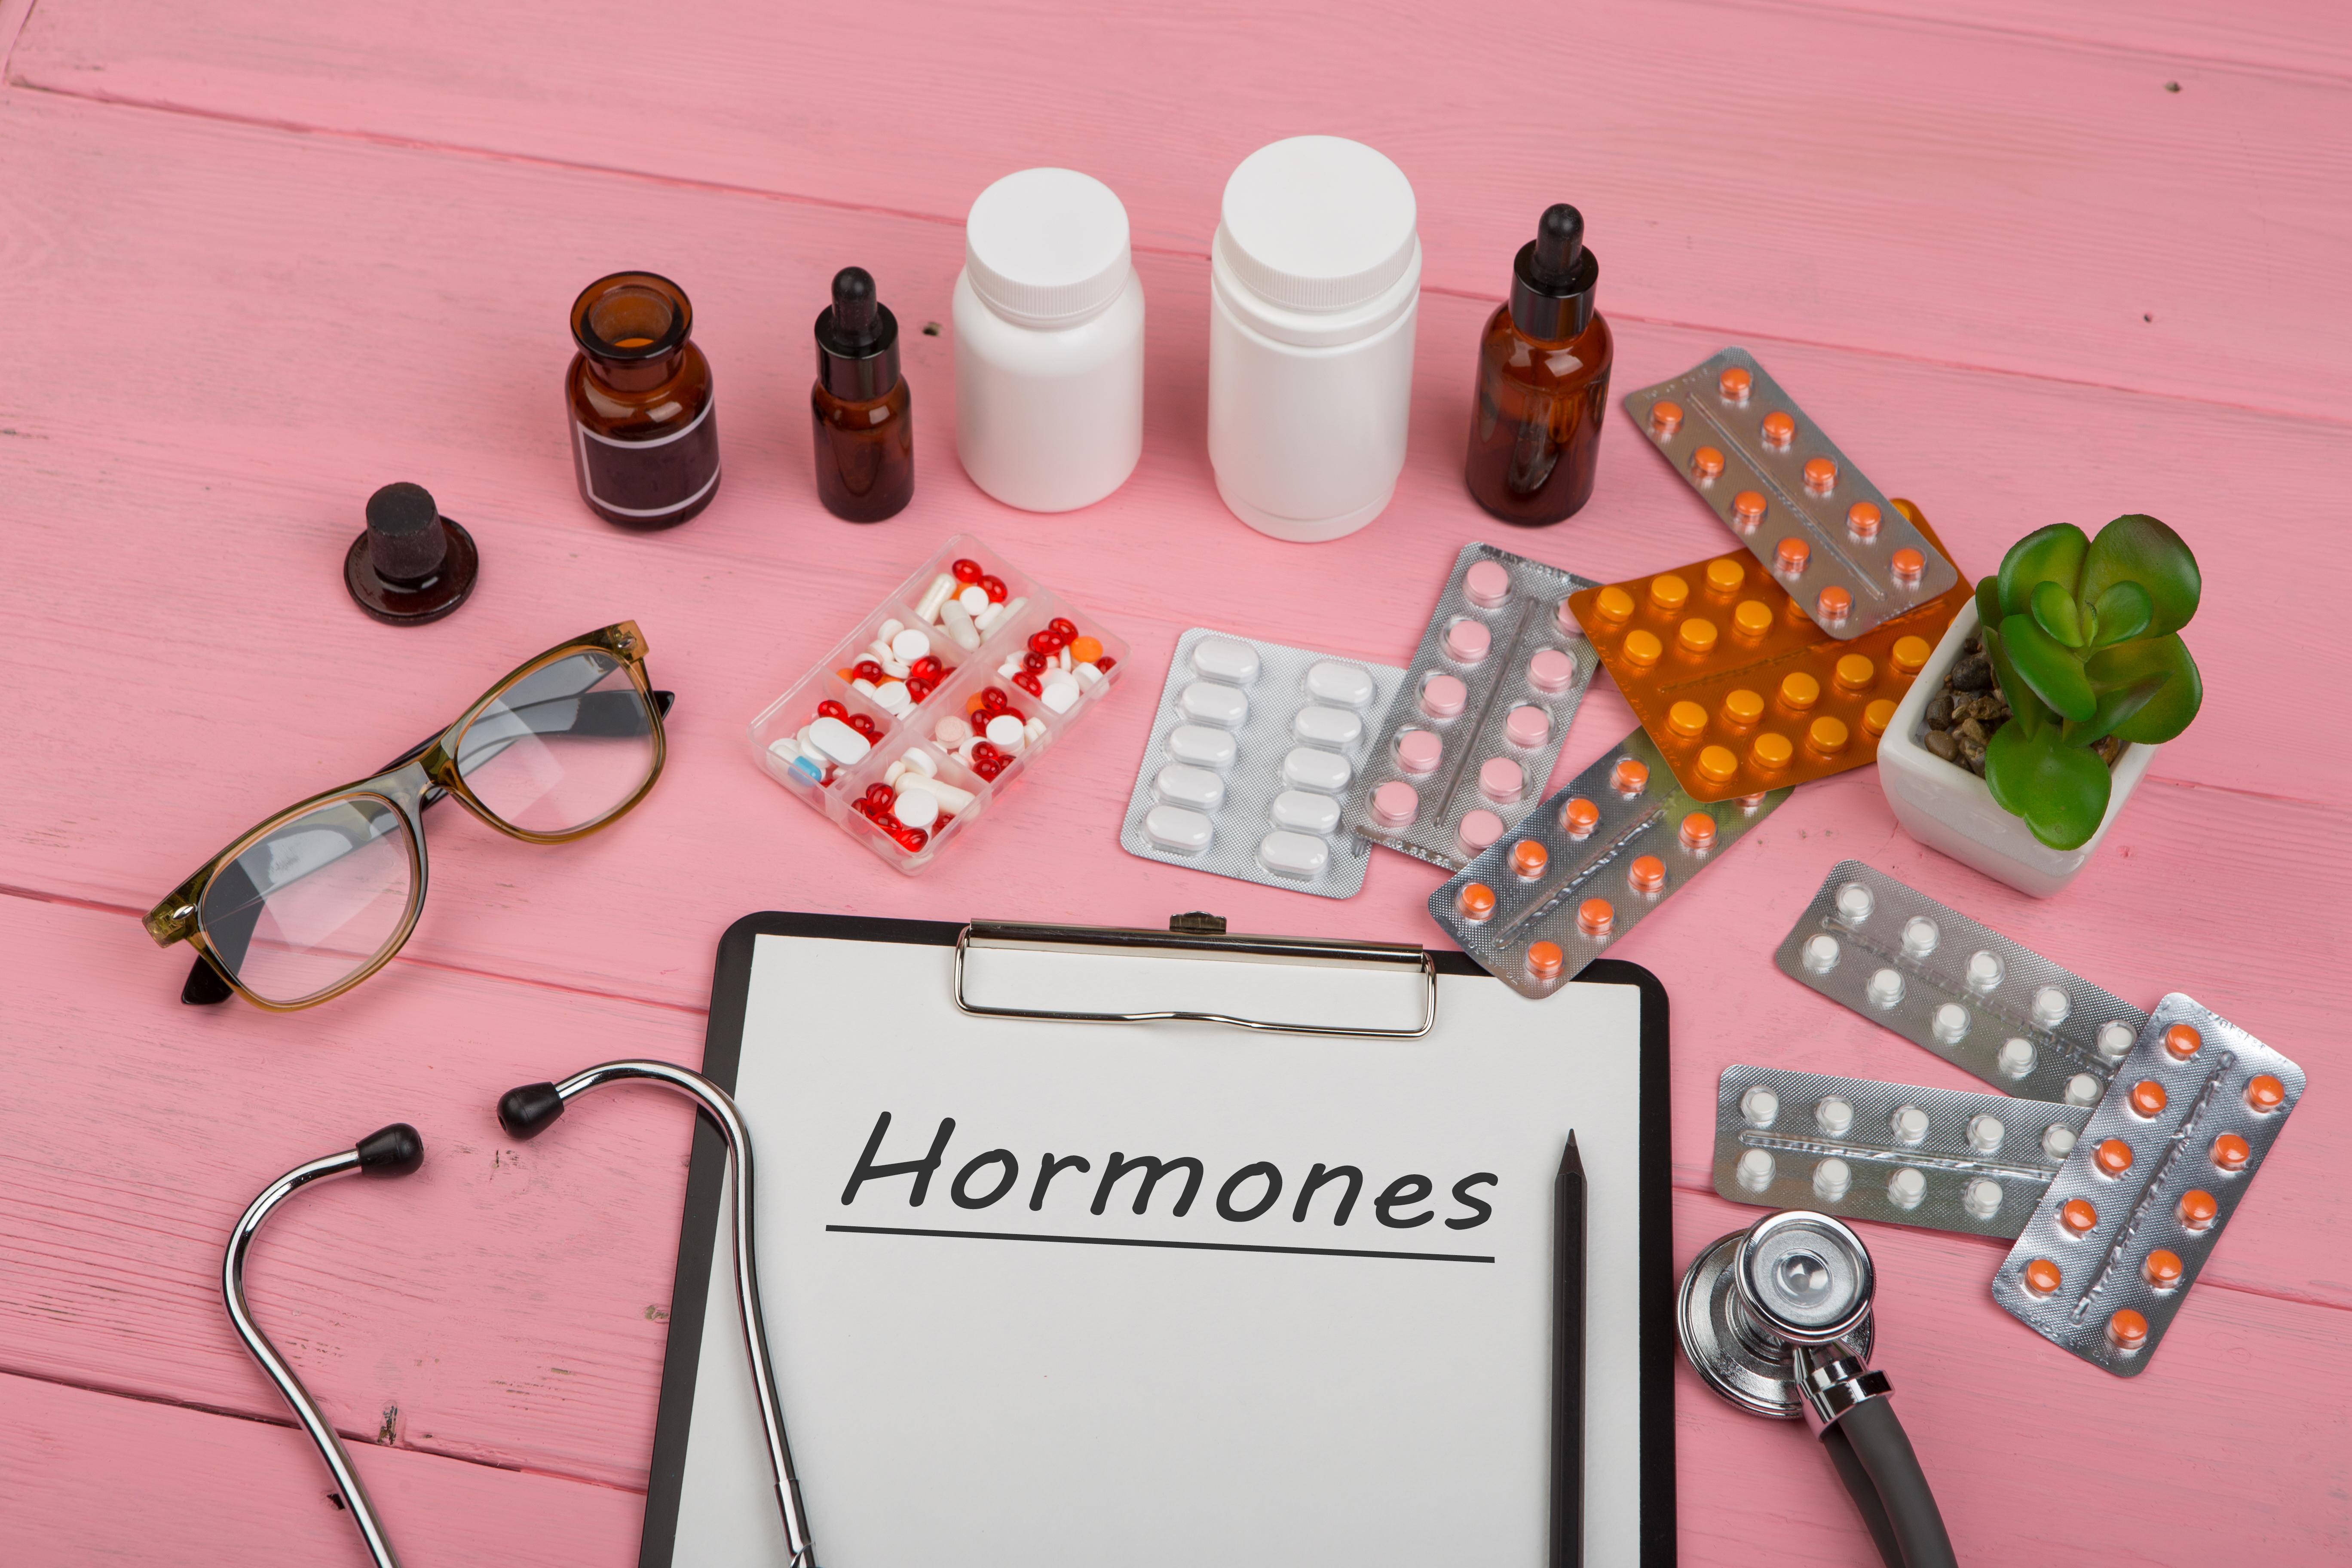 9 ознак наявності гормонального дисбалансу